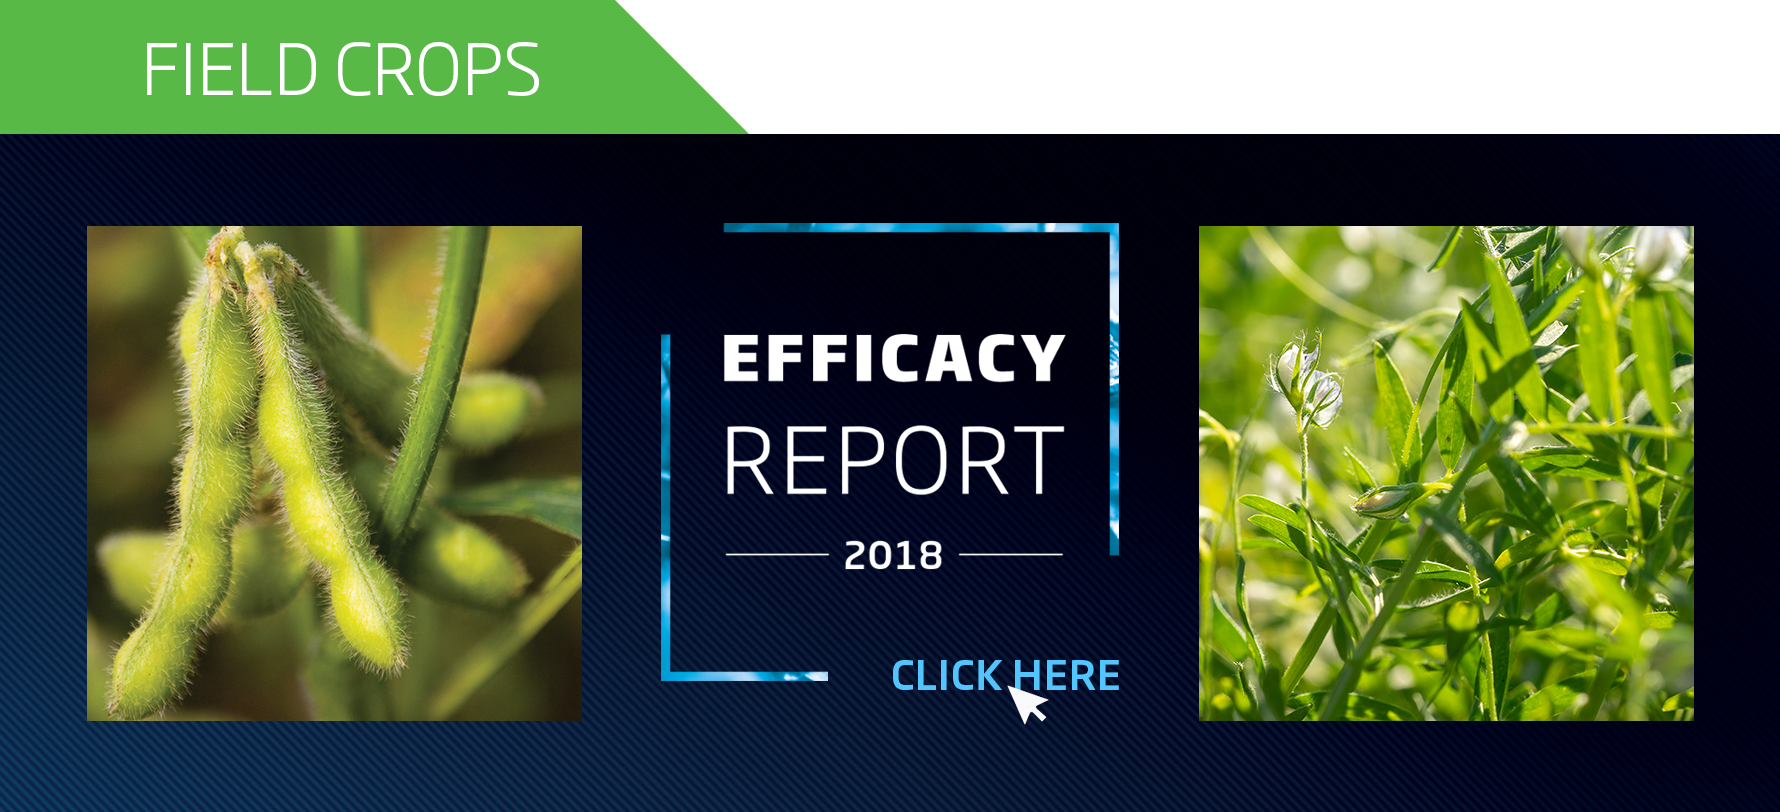 2018 Efficacy Report FIELD CROPS